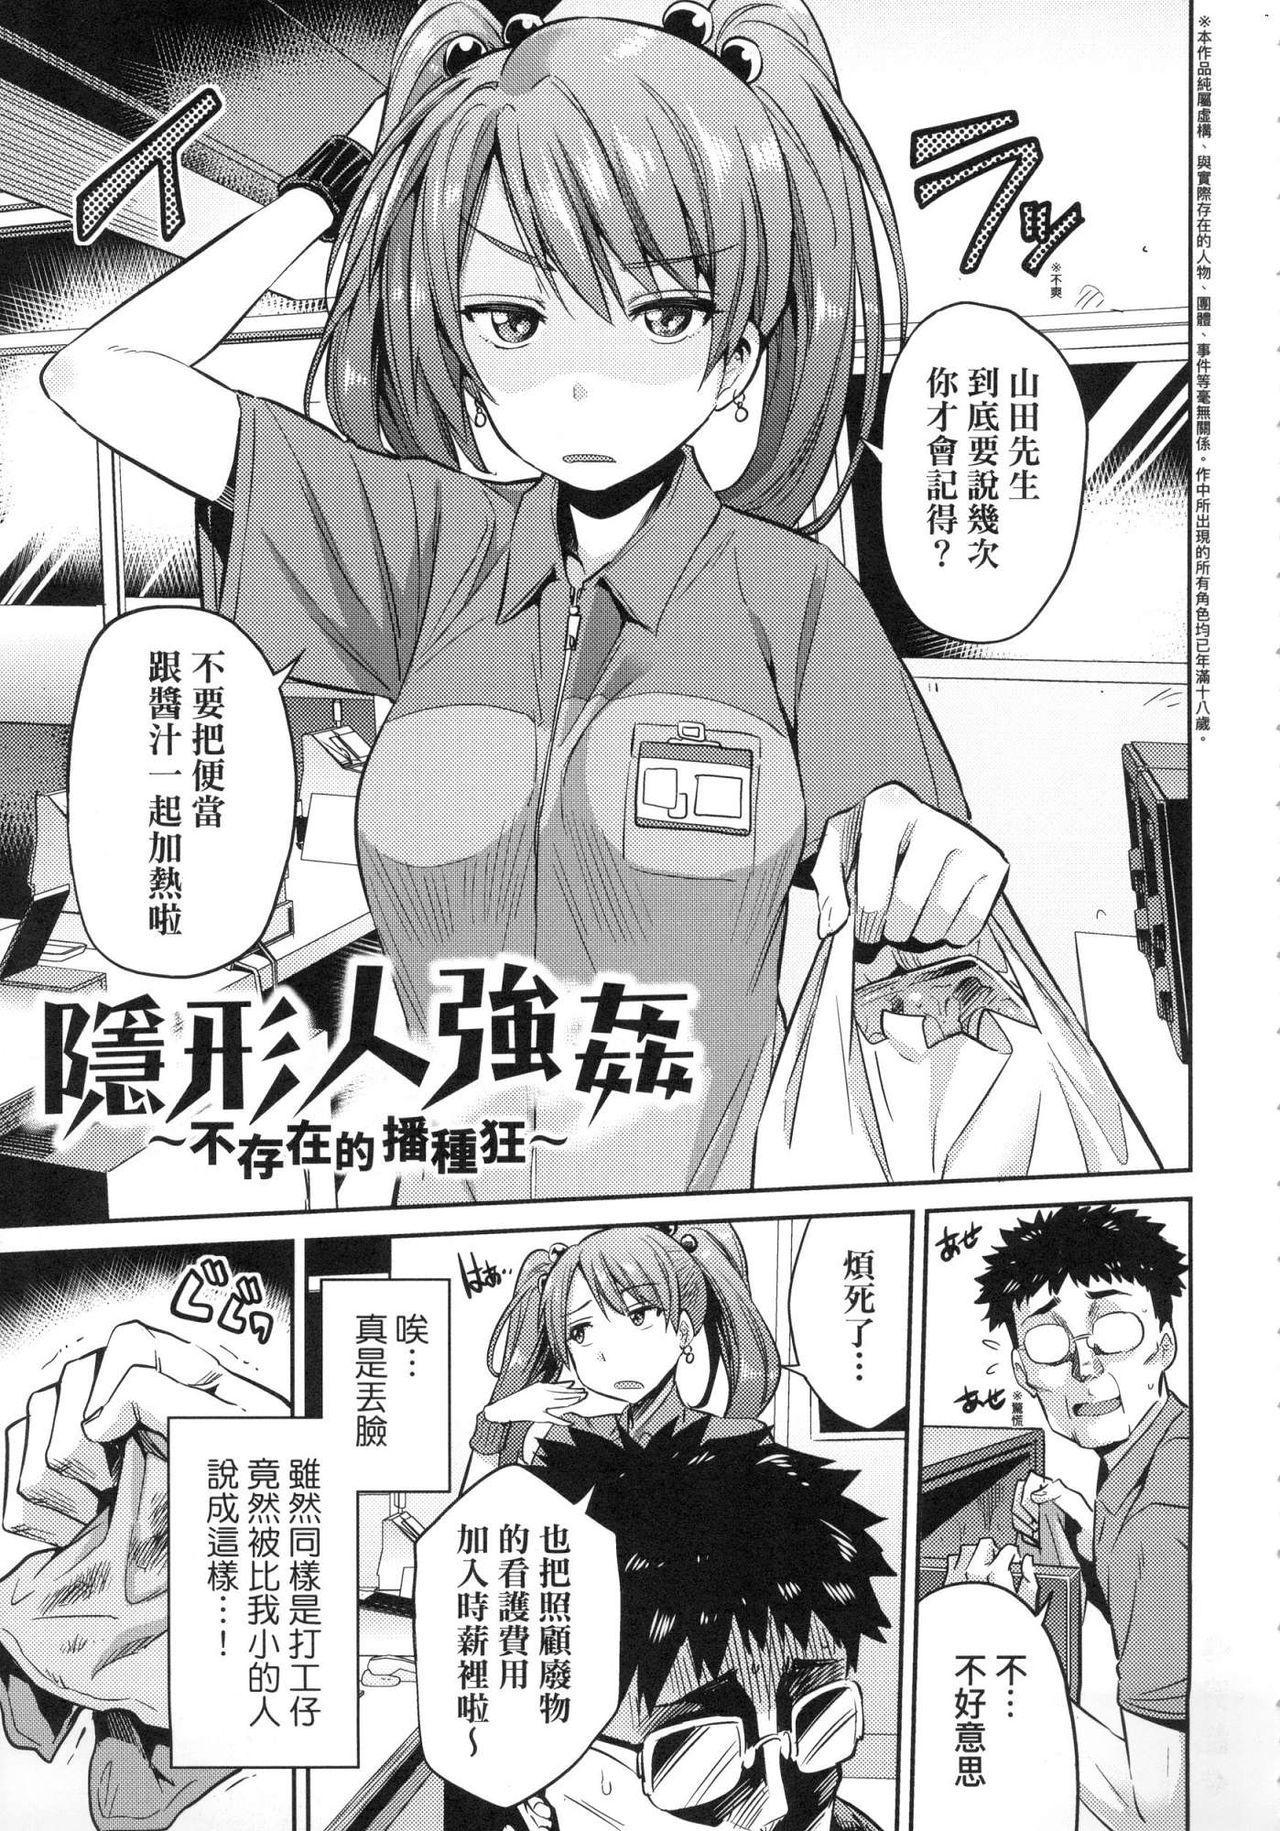 Kyousei Tanetsuke Express - Forced Seeding Express 48